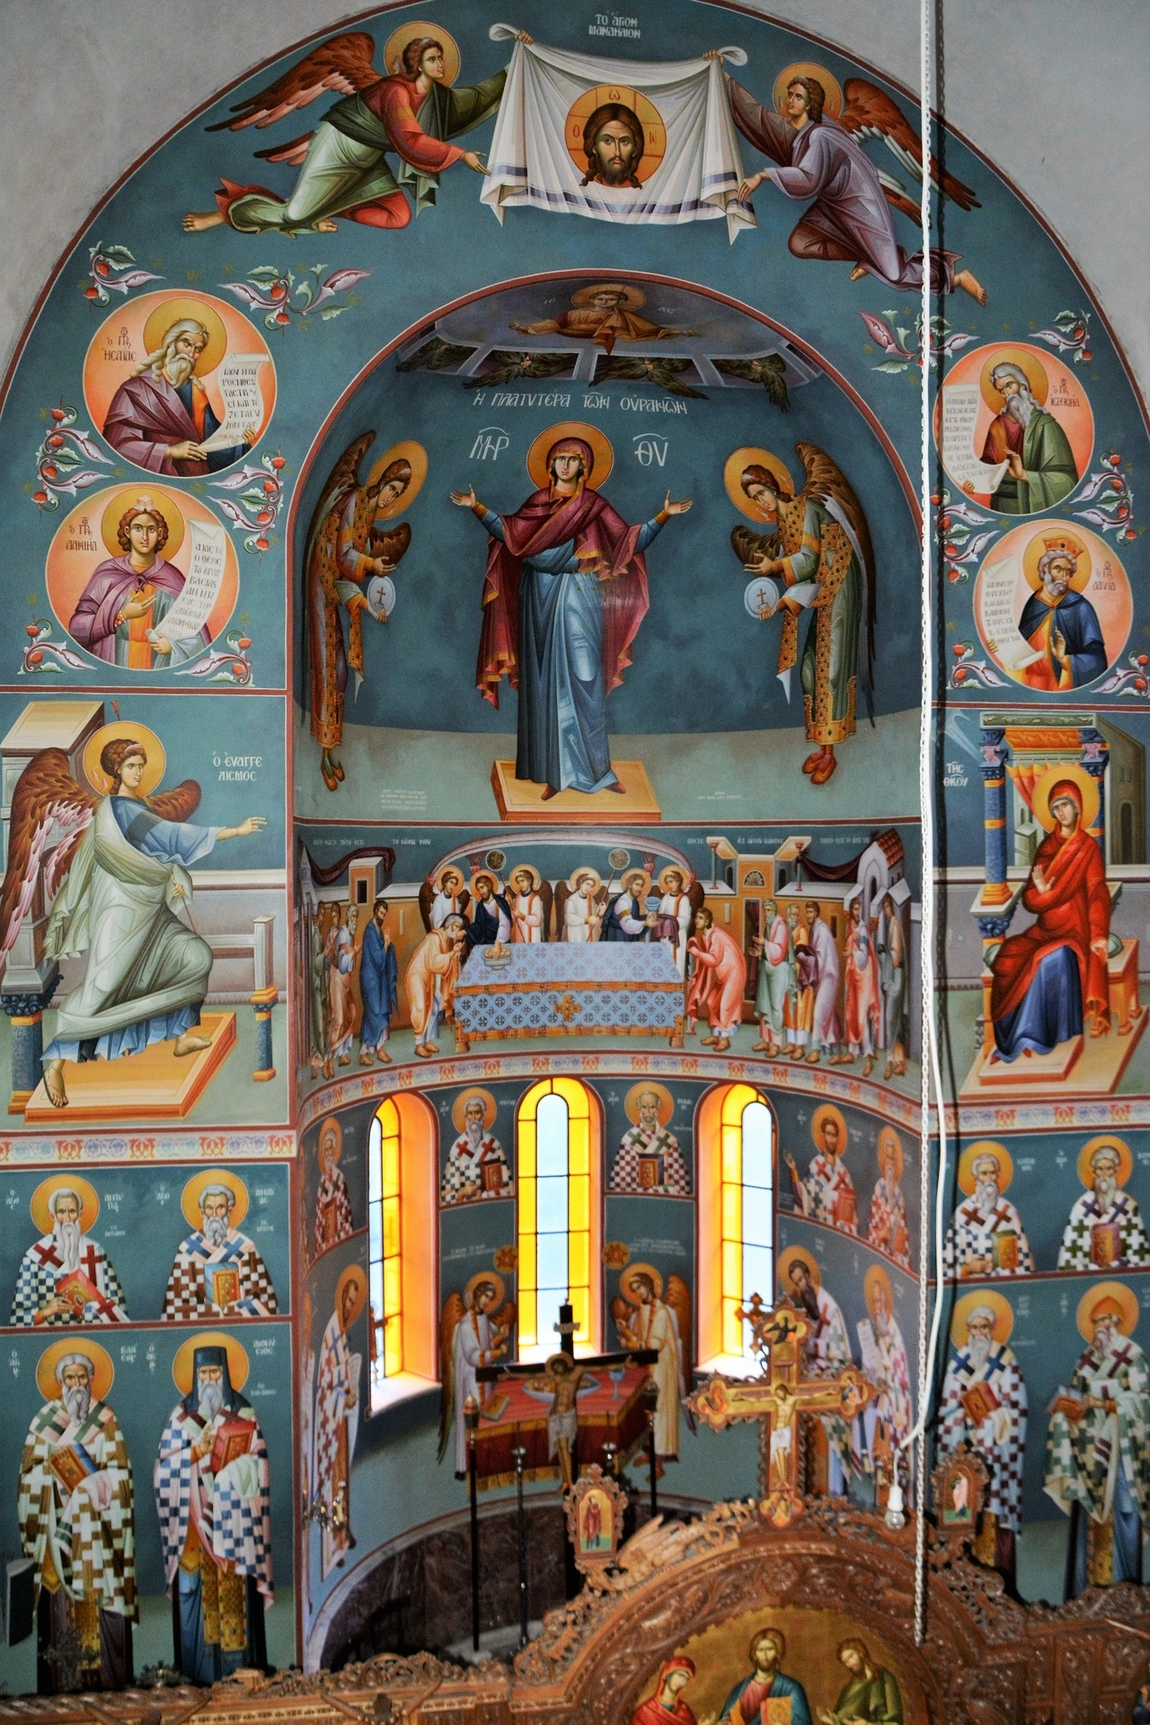 Themis Petrou - Saint Dioniso's Church